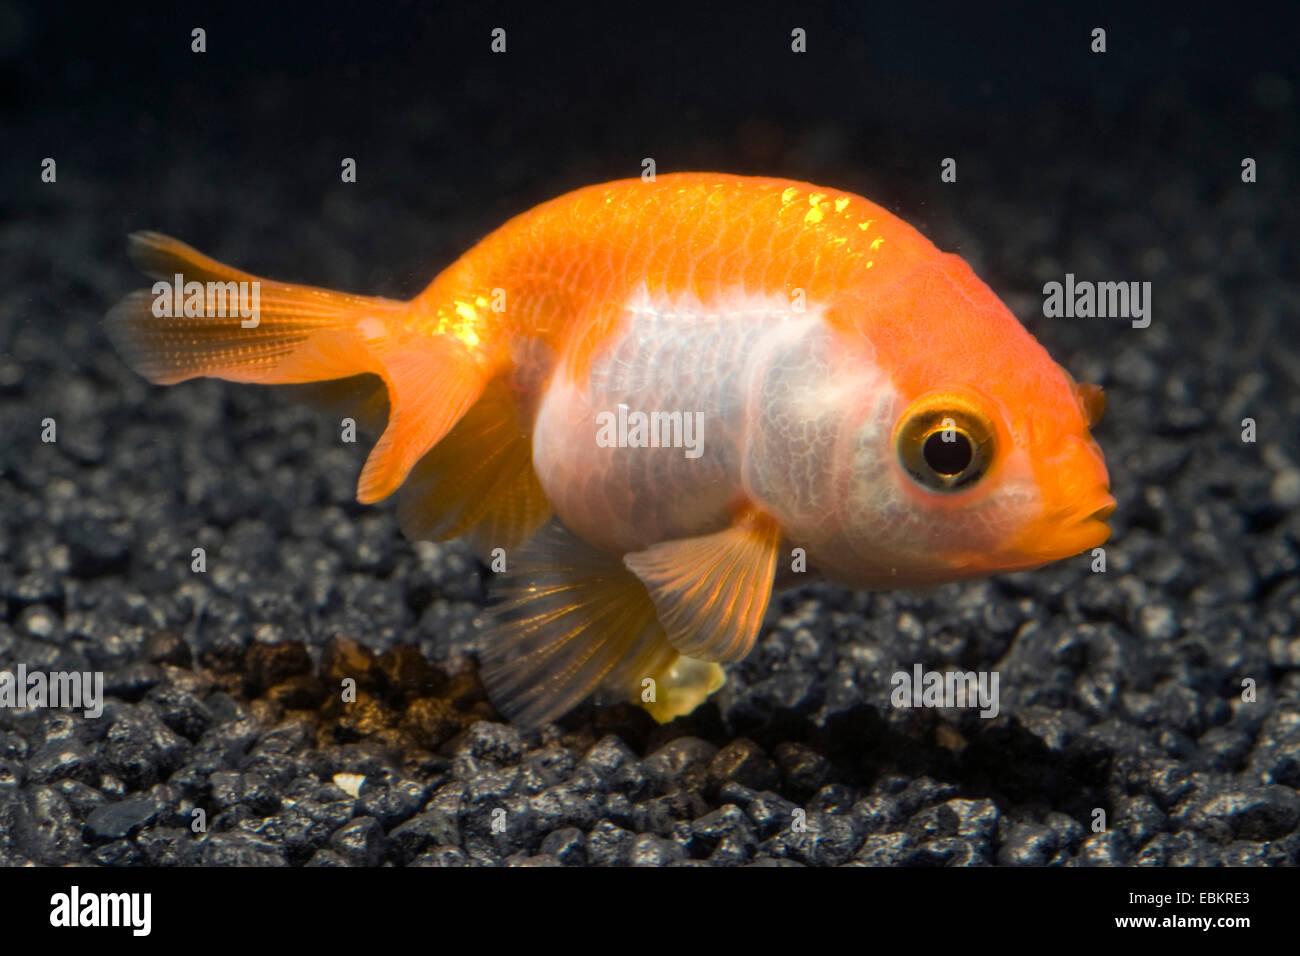 Goldfish, Common carp (Carassius auratus), breeding form red and white eggfish - Stock Image